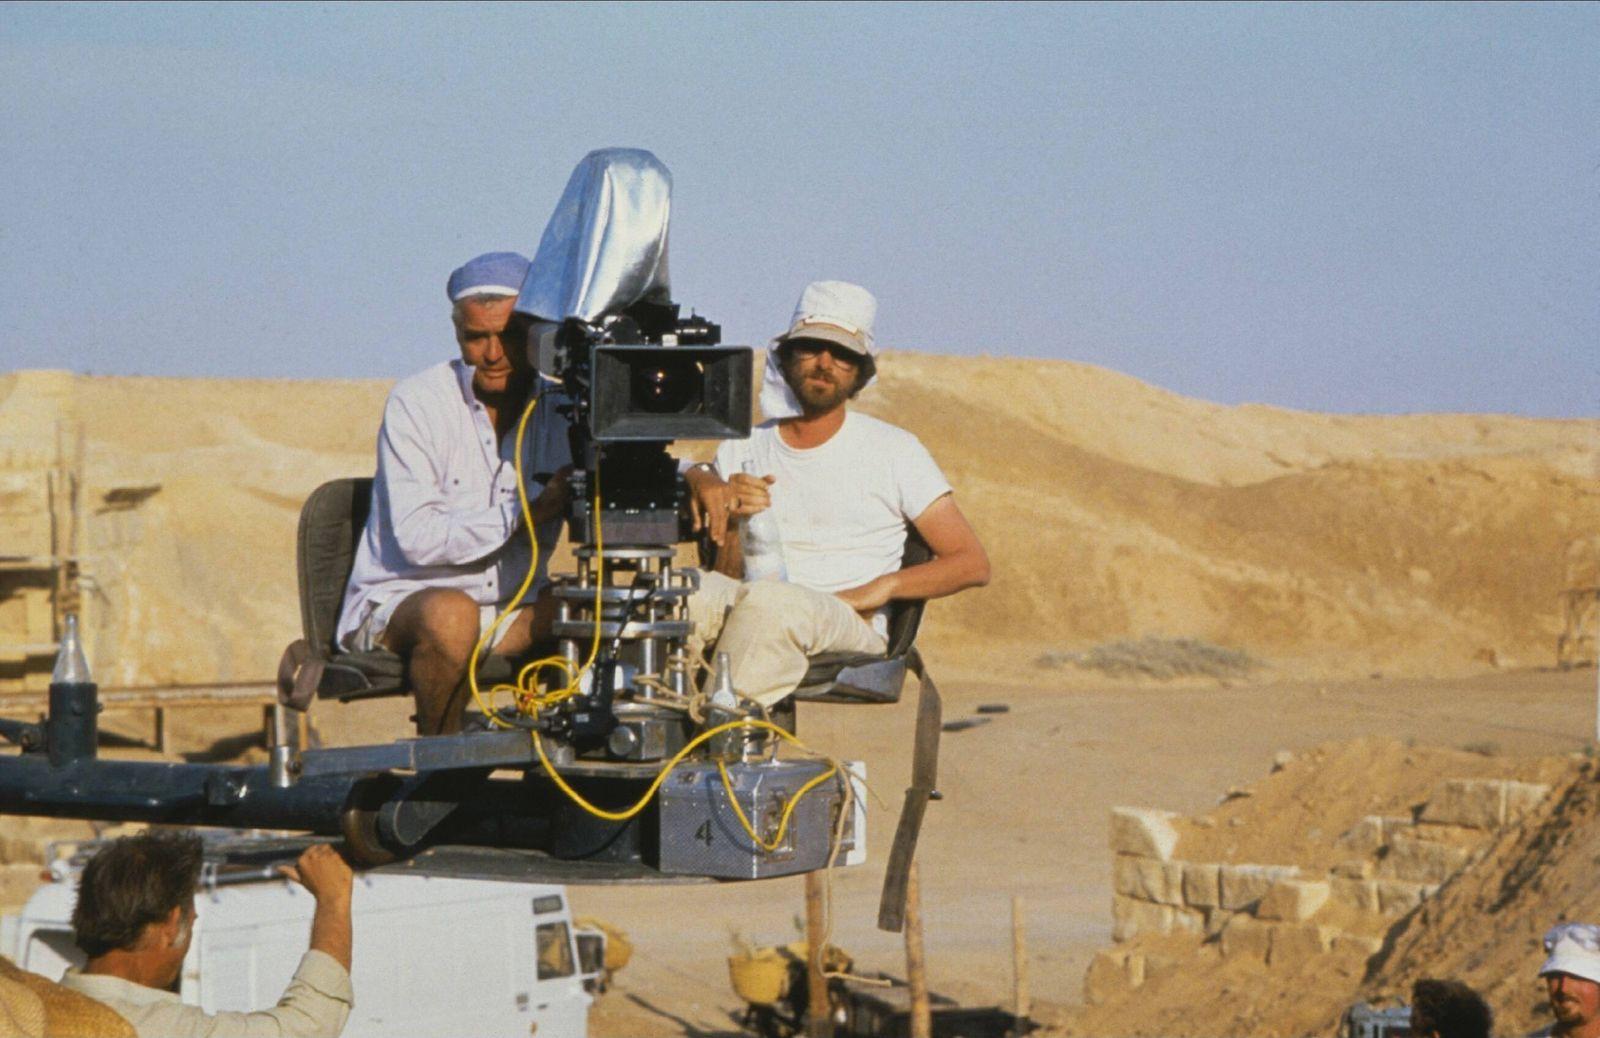 Douglas Slocombe & Steven Spielberg Film: Raiders Of The Lost Ark; Indiana Jones 1 (USA 1981) / Location: Tunesien (Tune